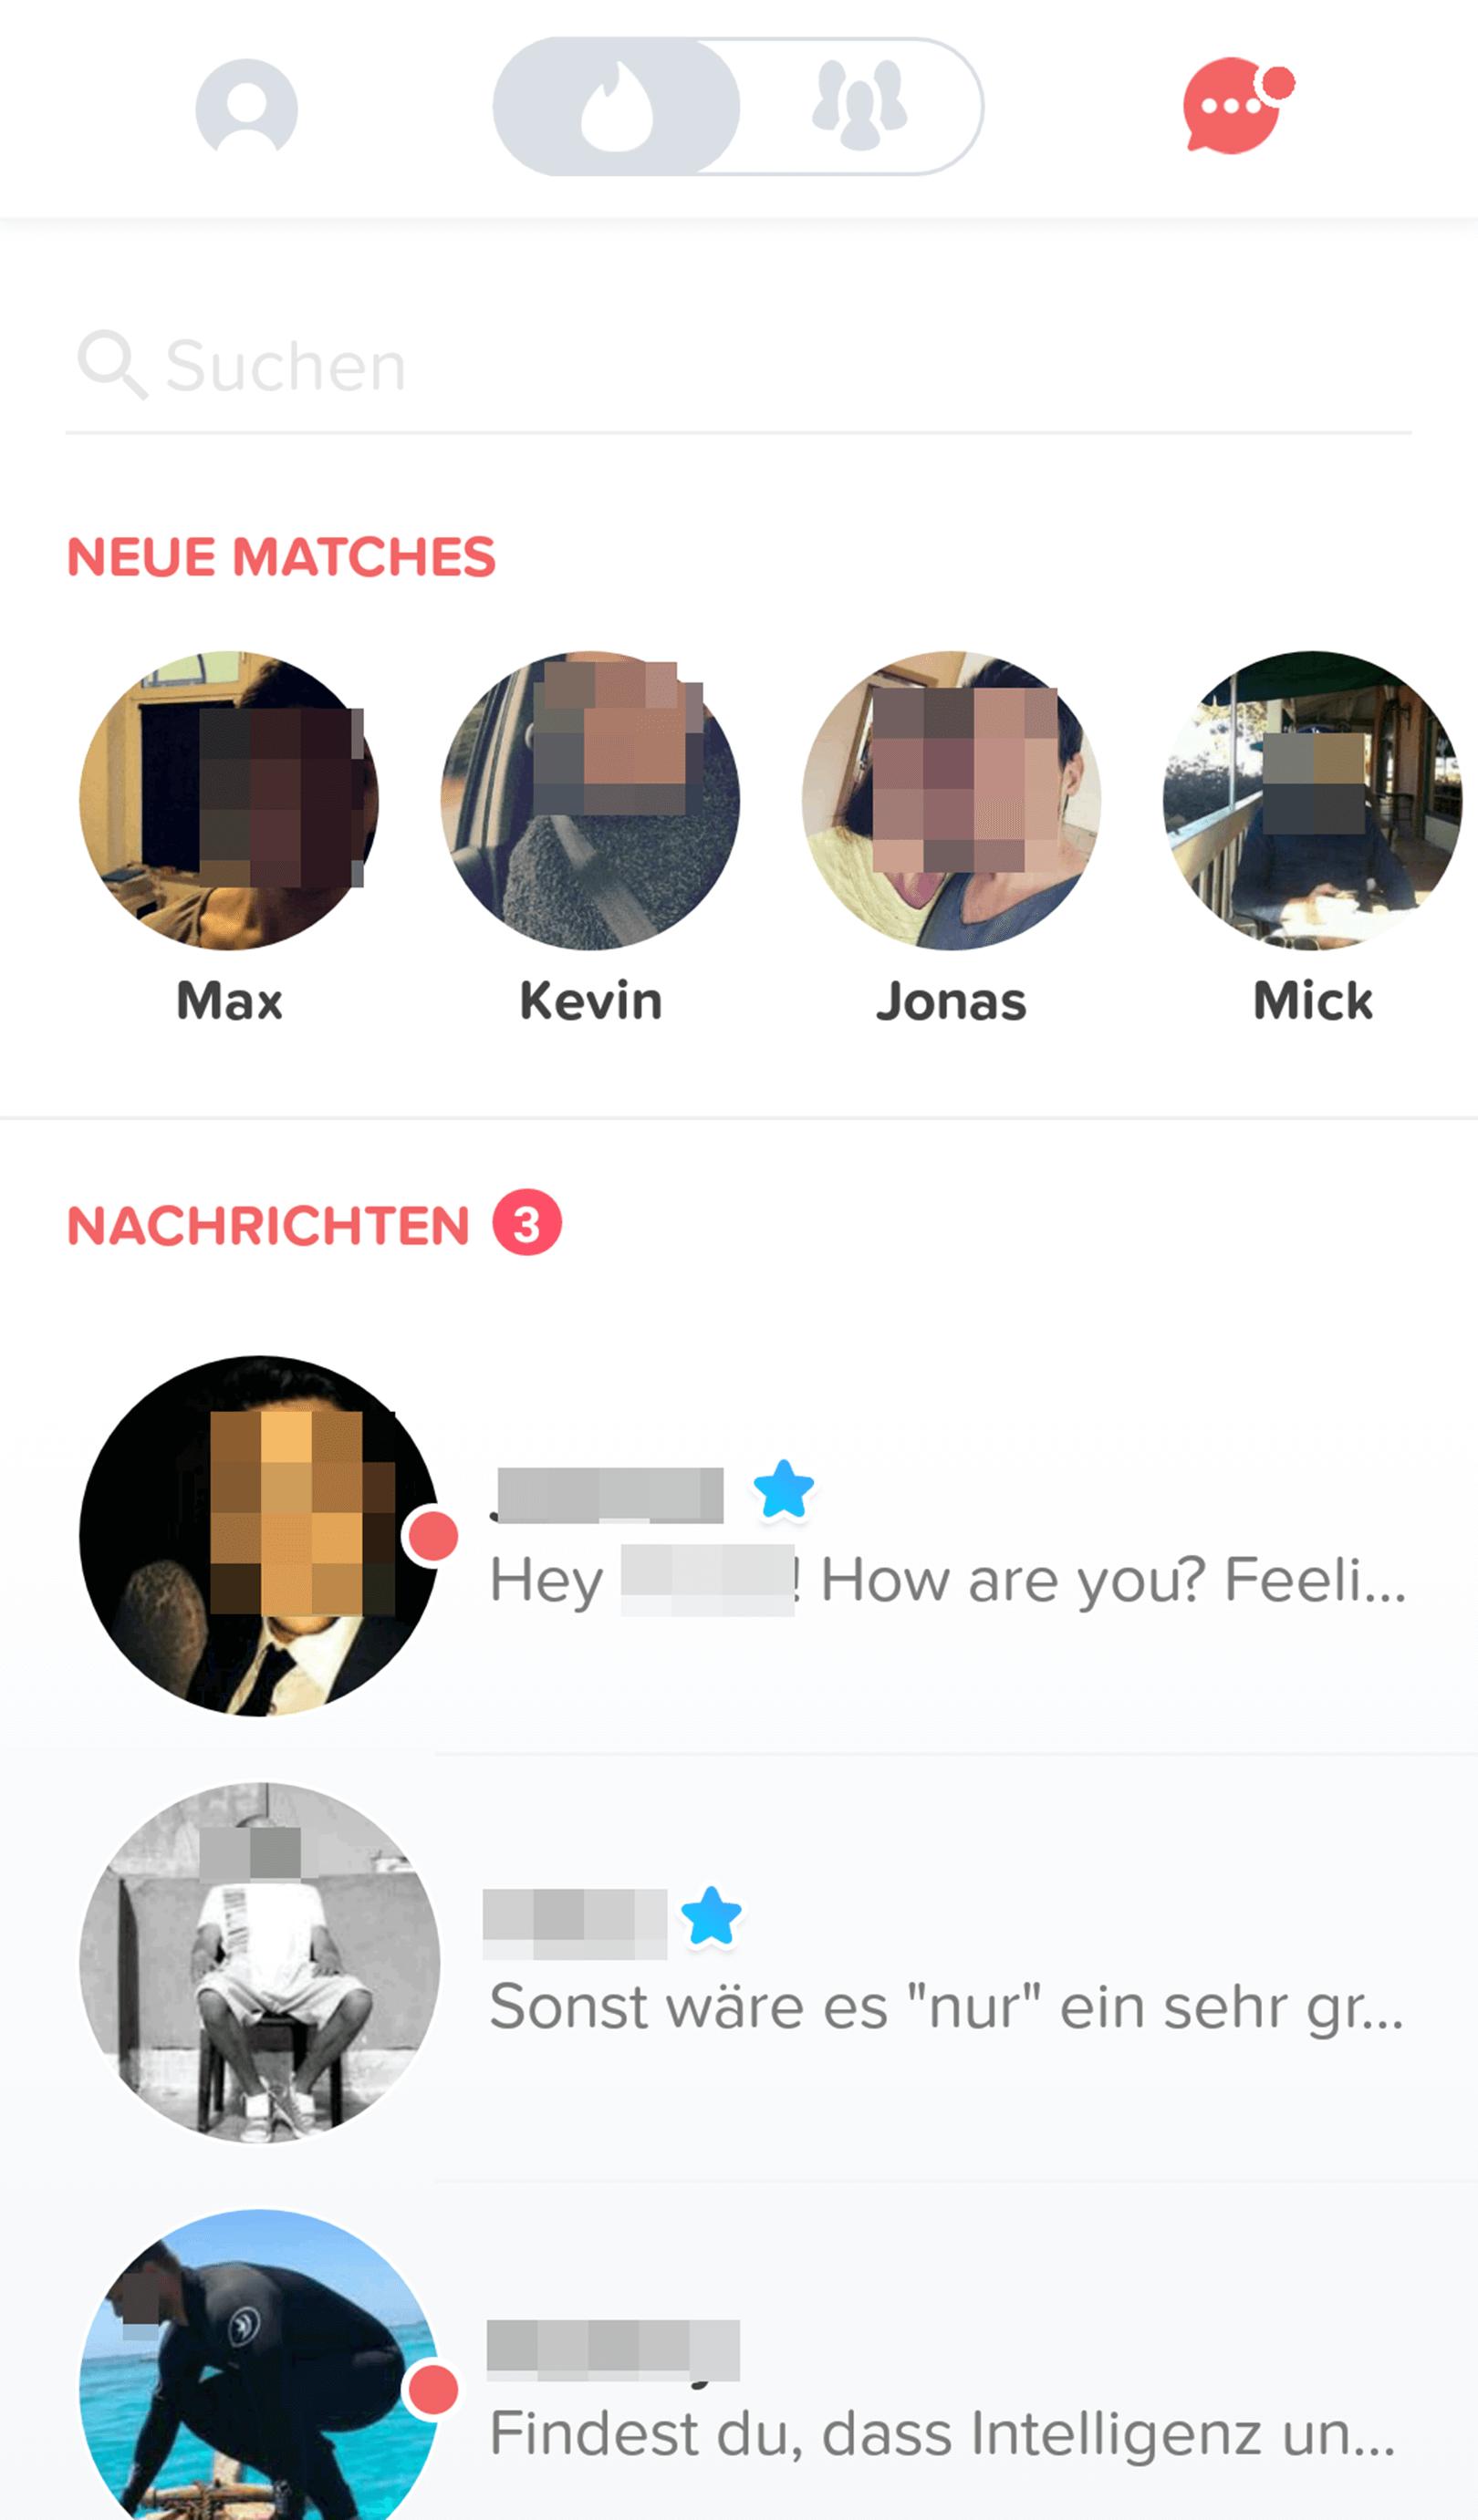 Tinder Matches